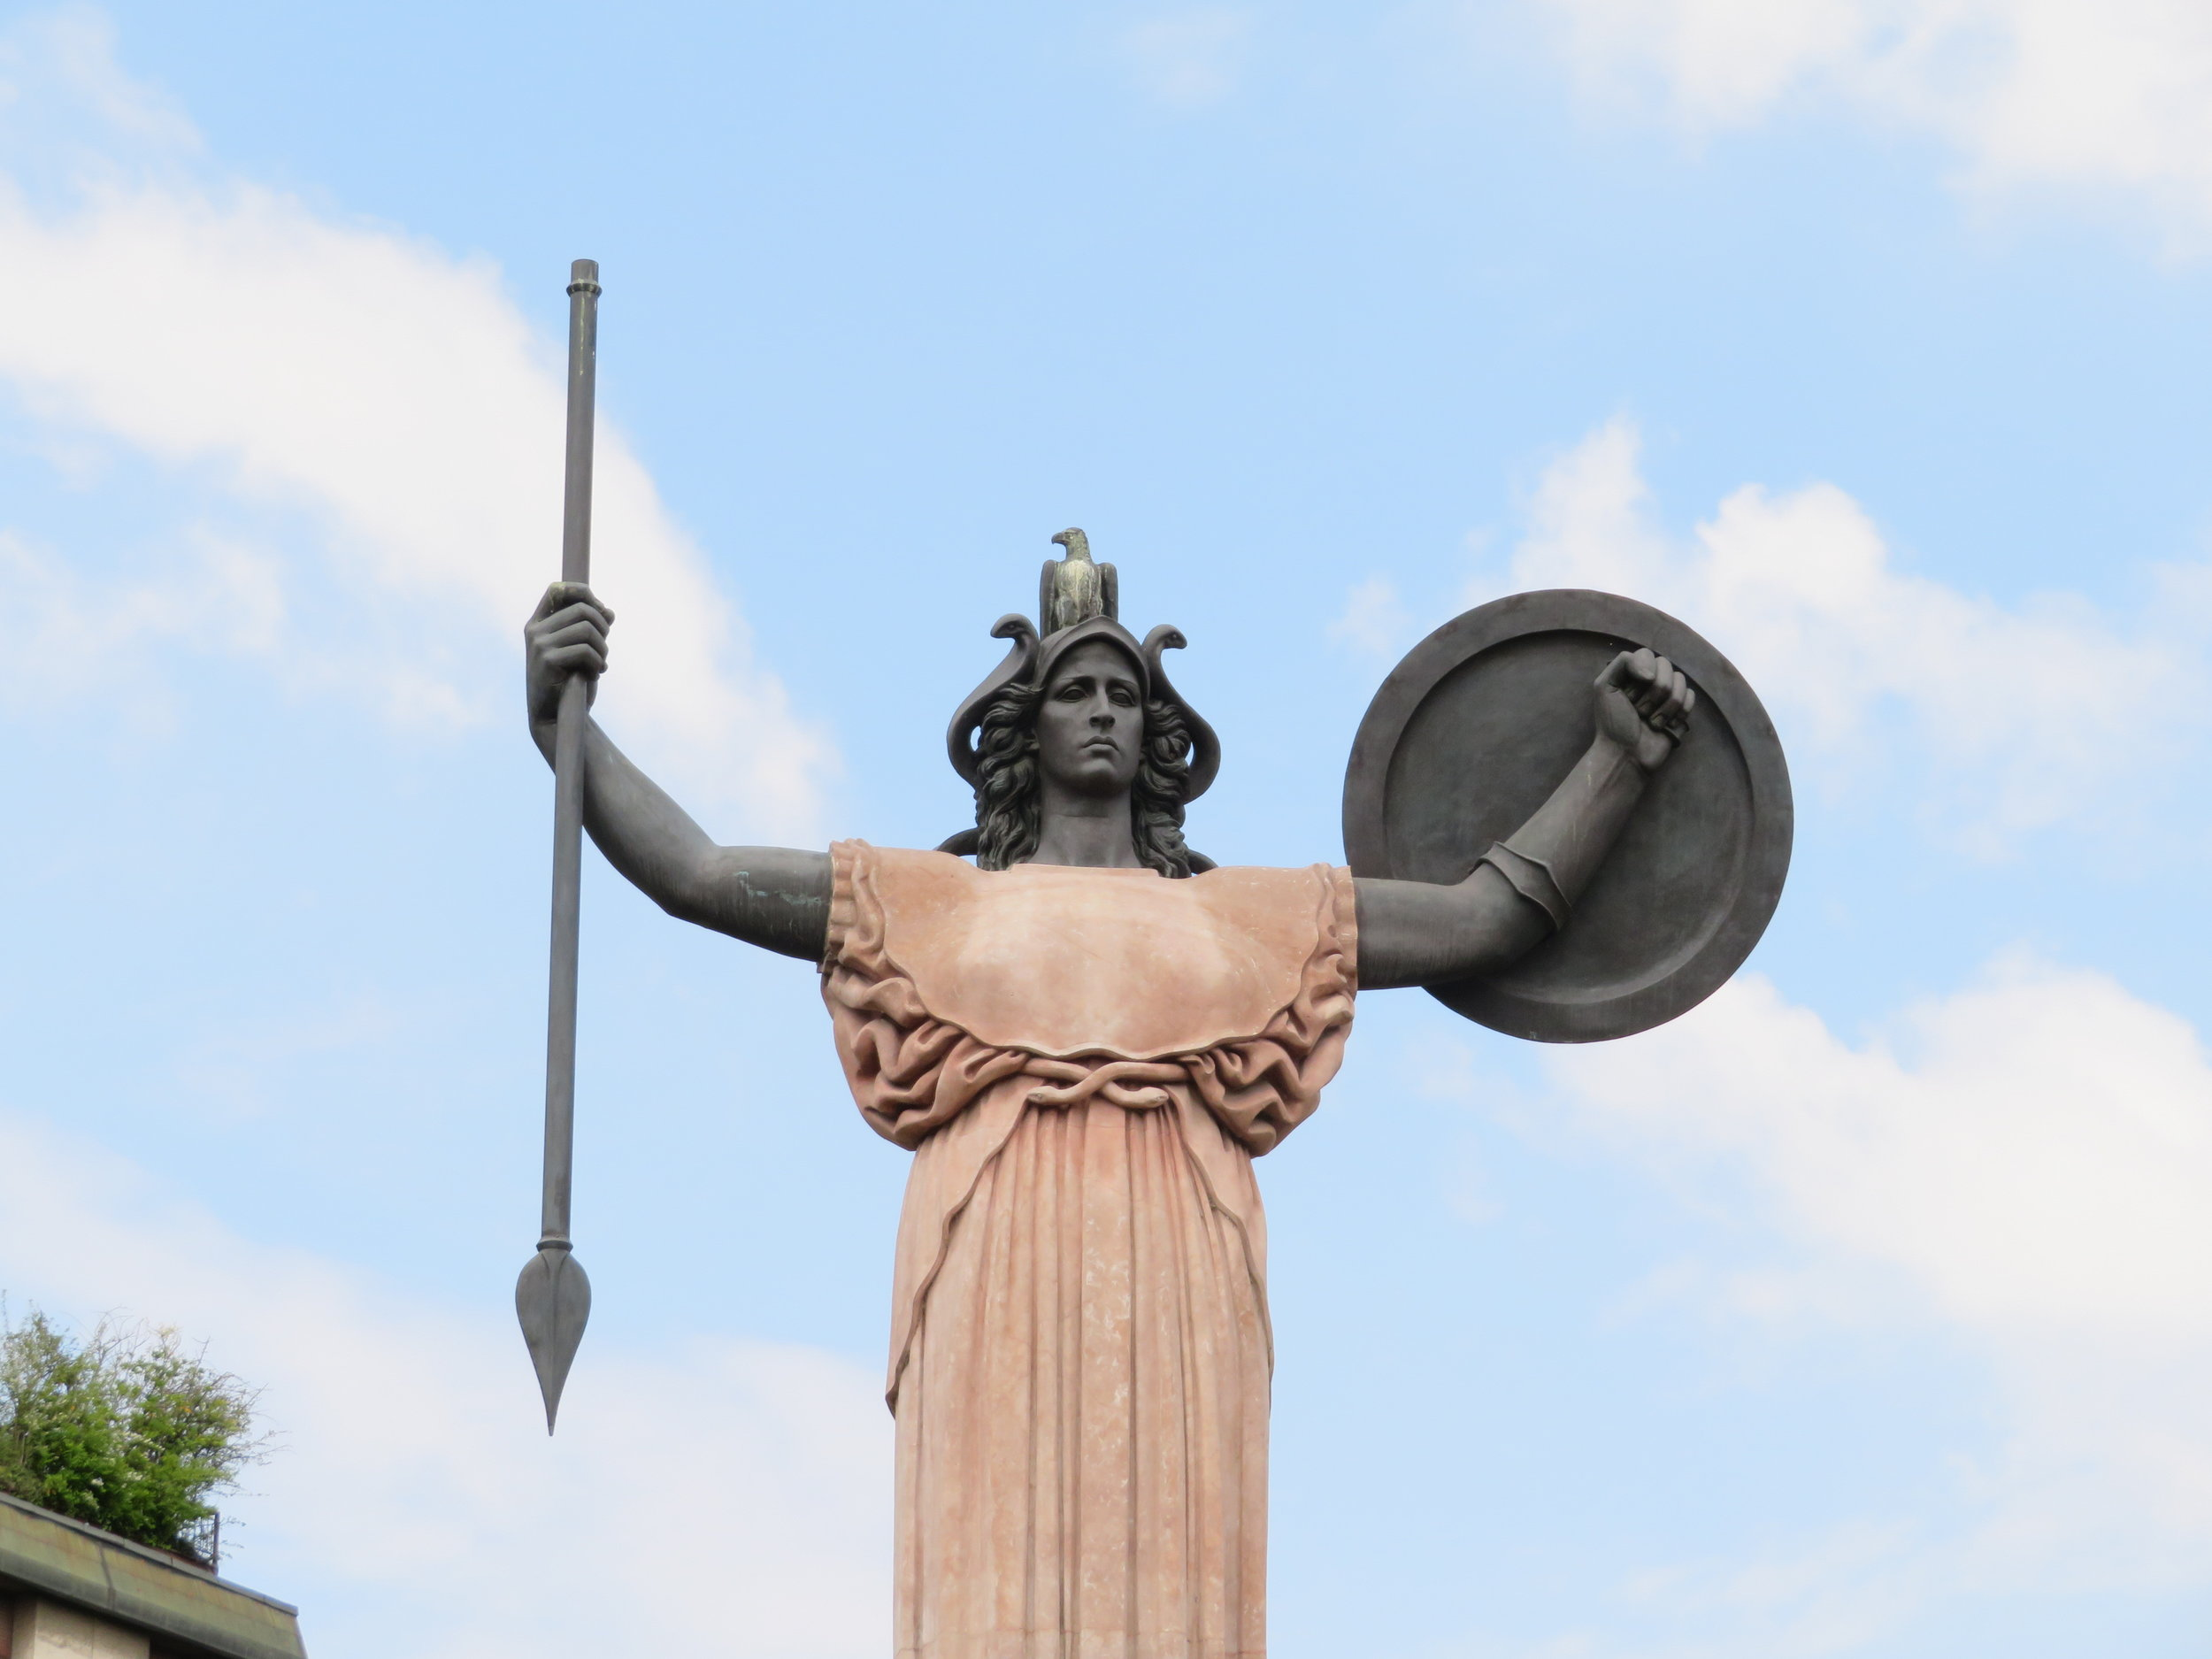 Minerva of Pavia